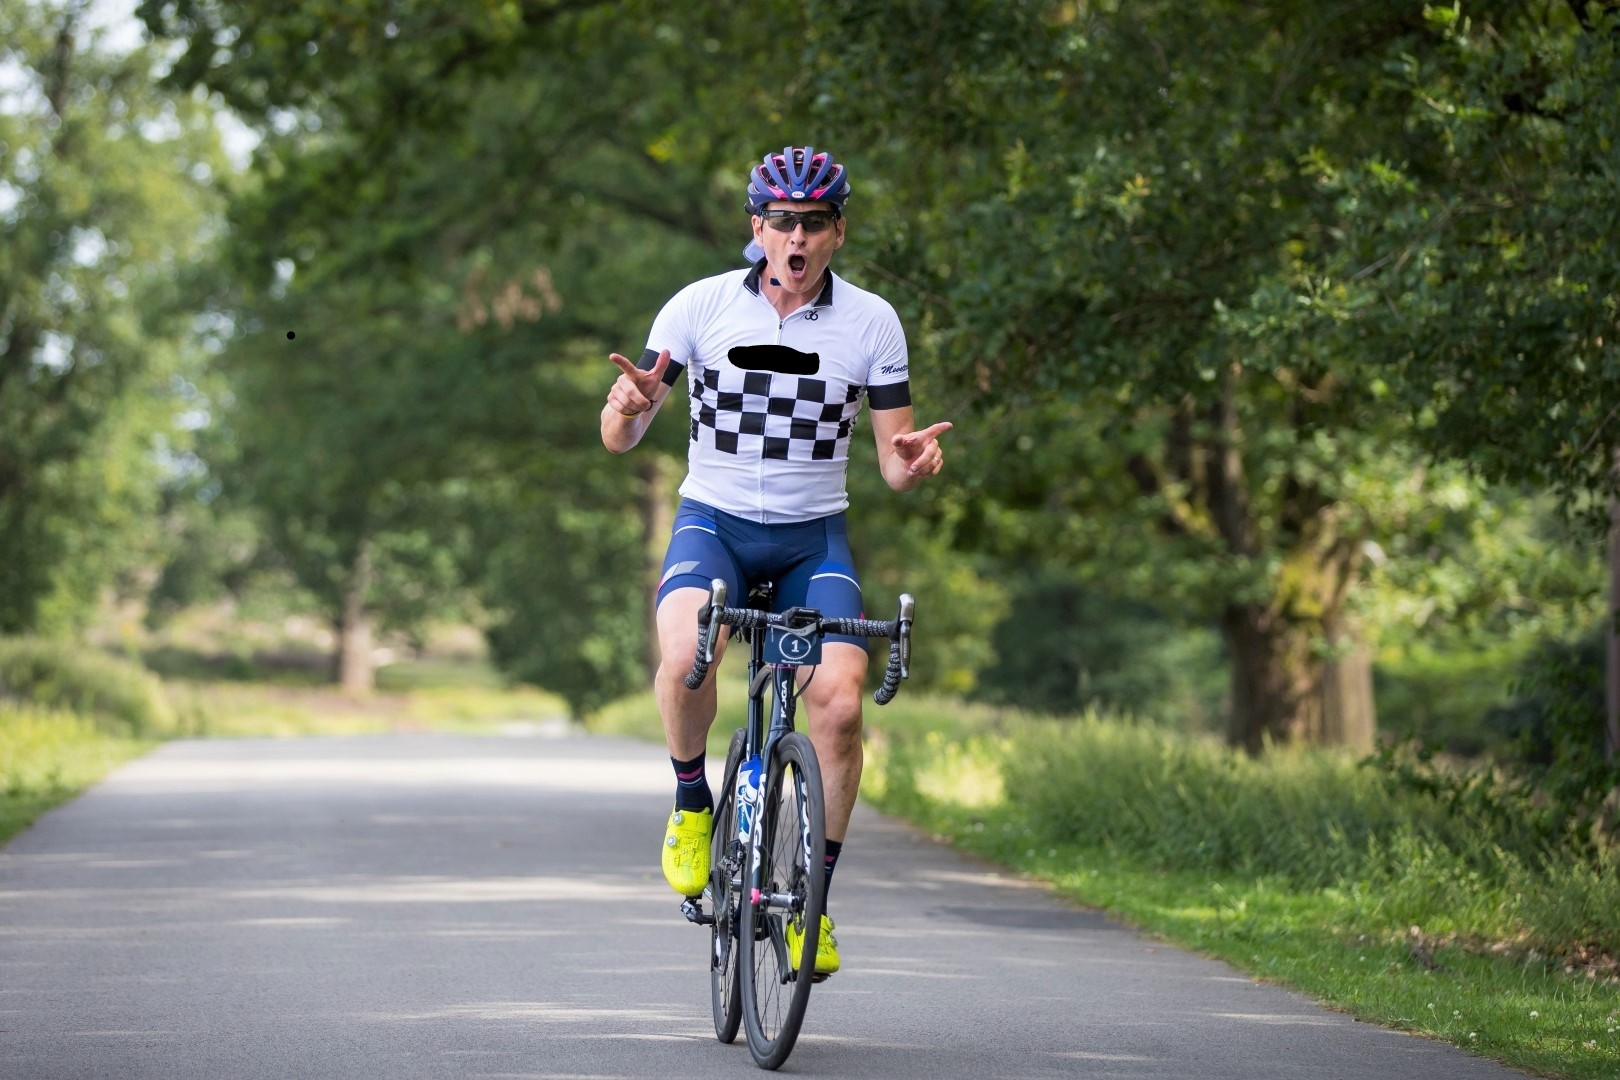 Blije renner Lexence MIR Sportmarkeitg